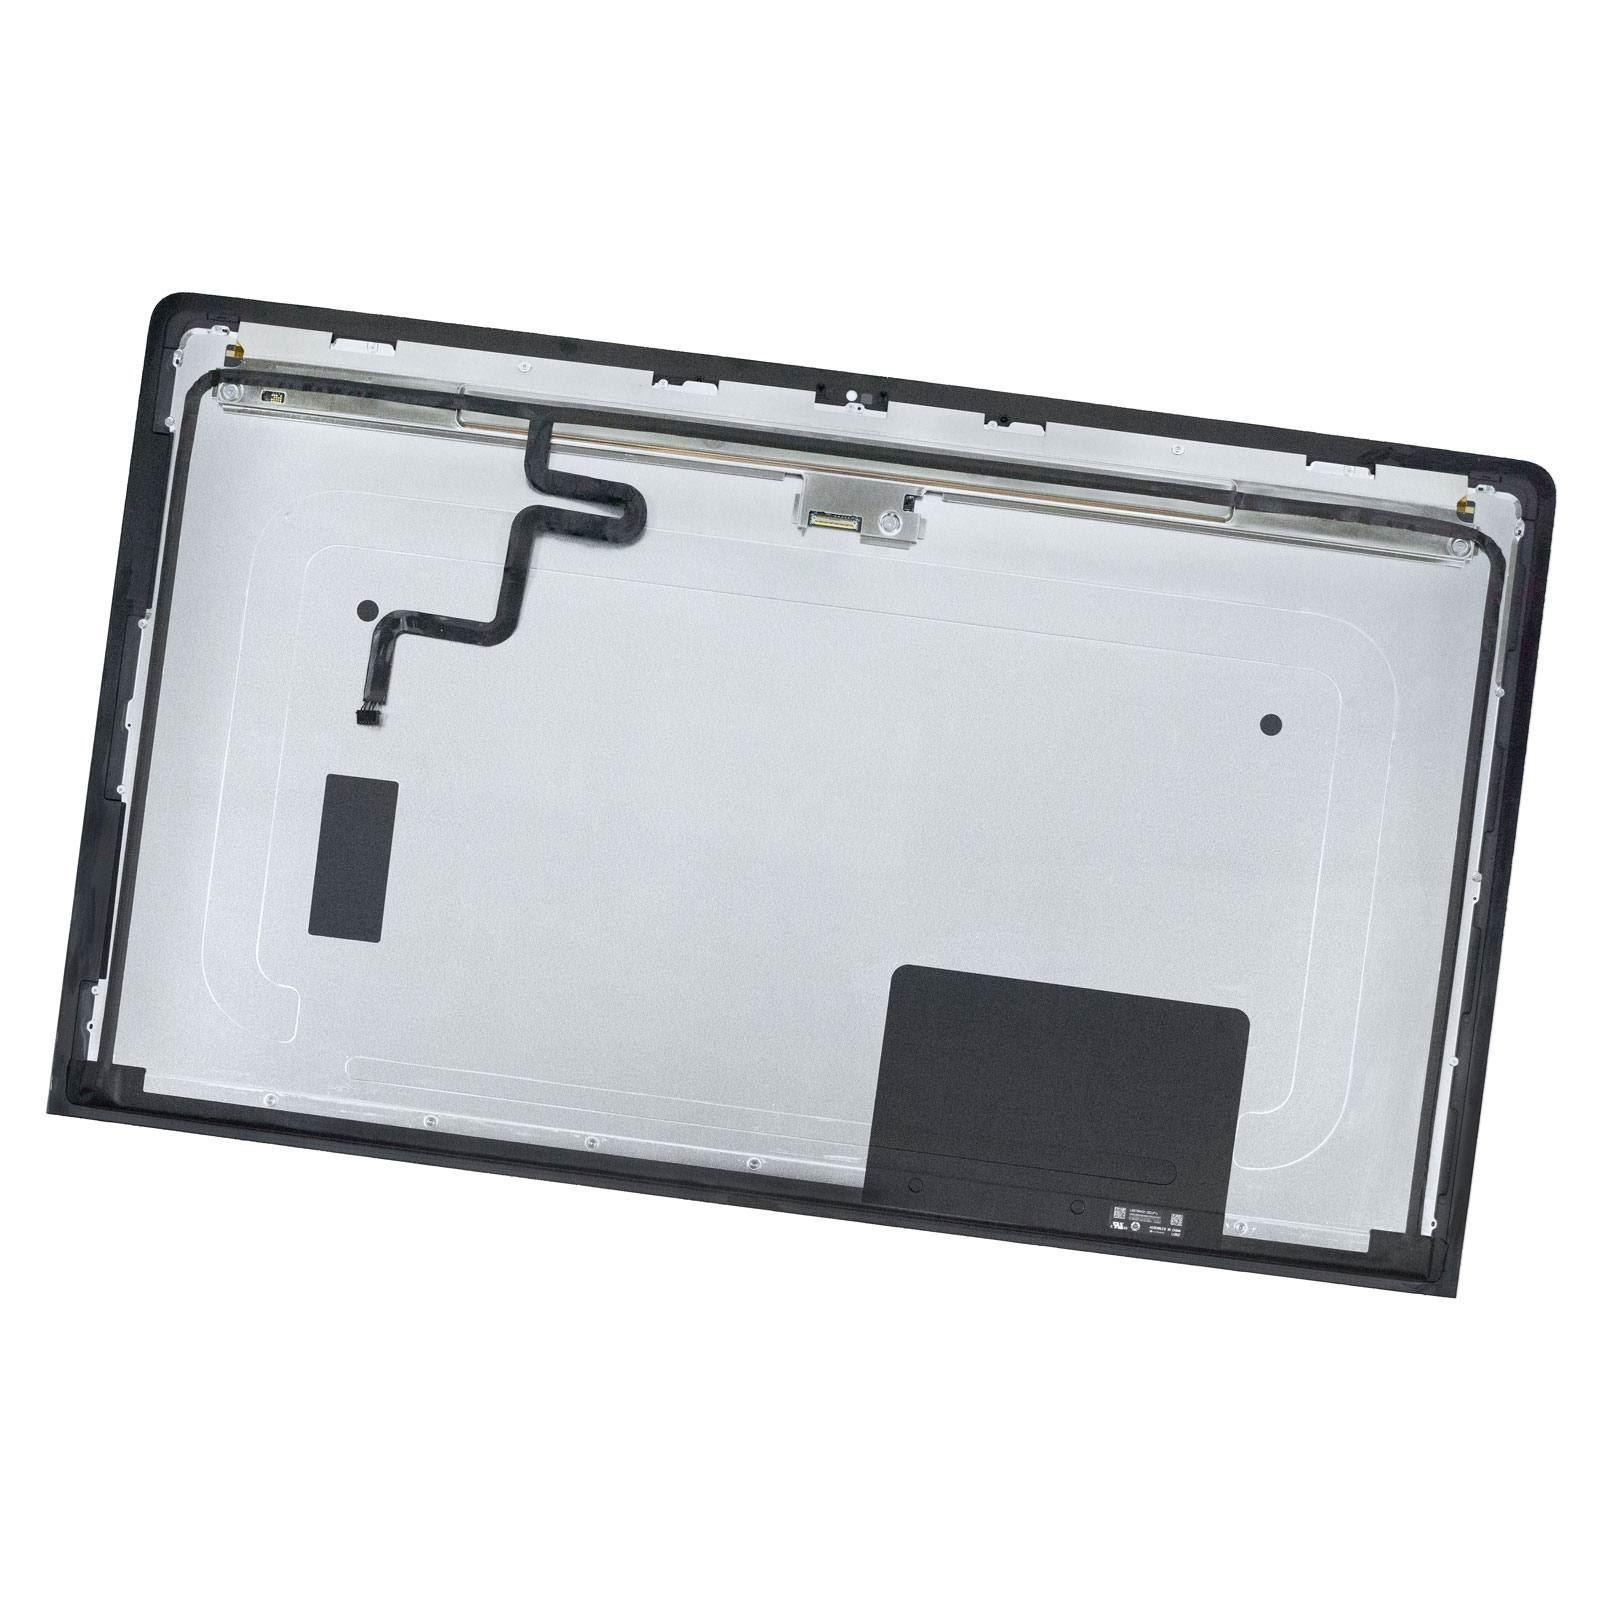 661-7885Apple LCD Displayfor iMac 27 inch Late 2013 A1419